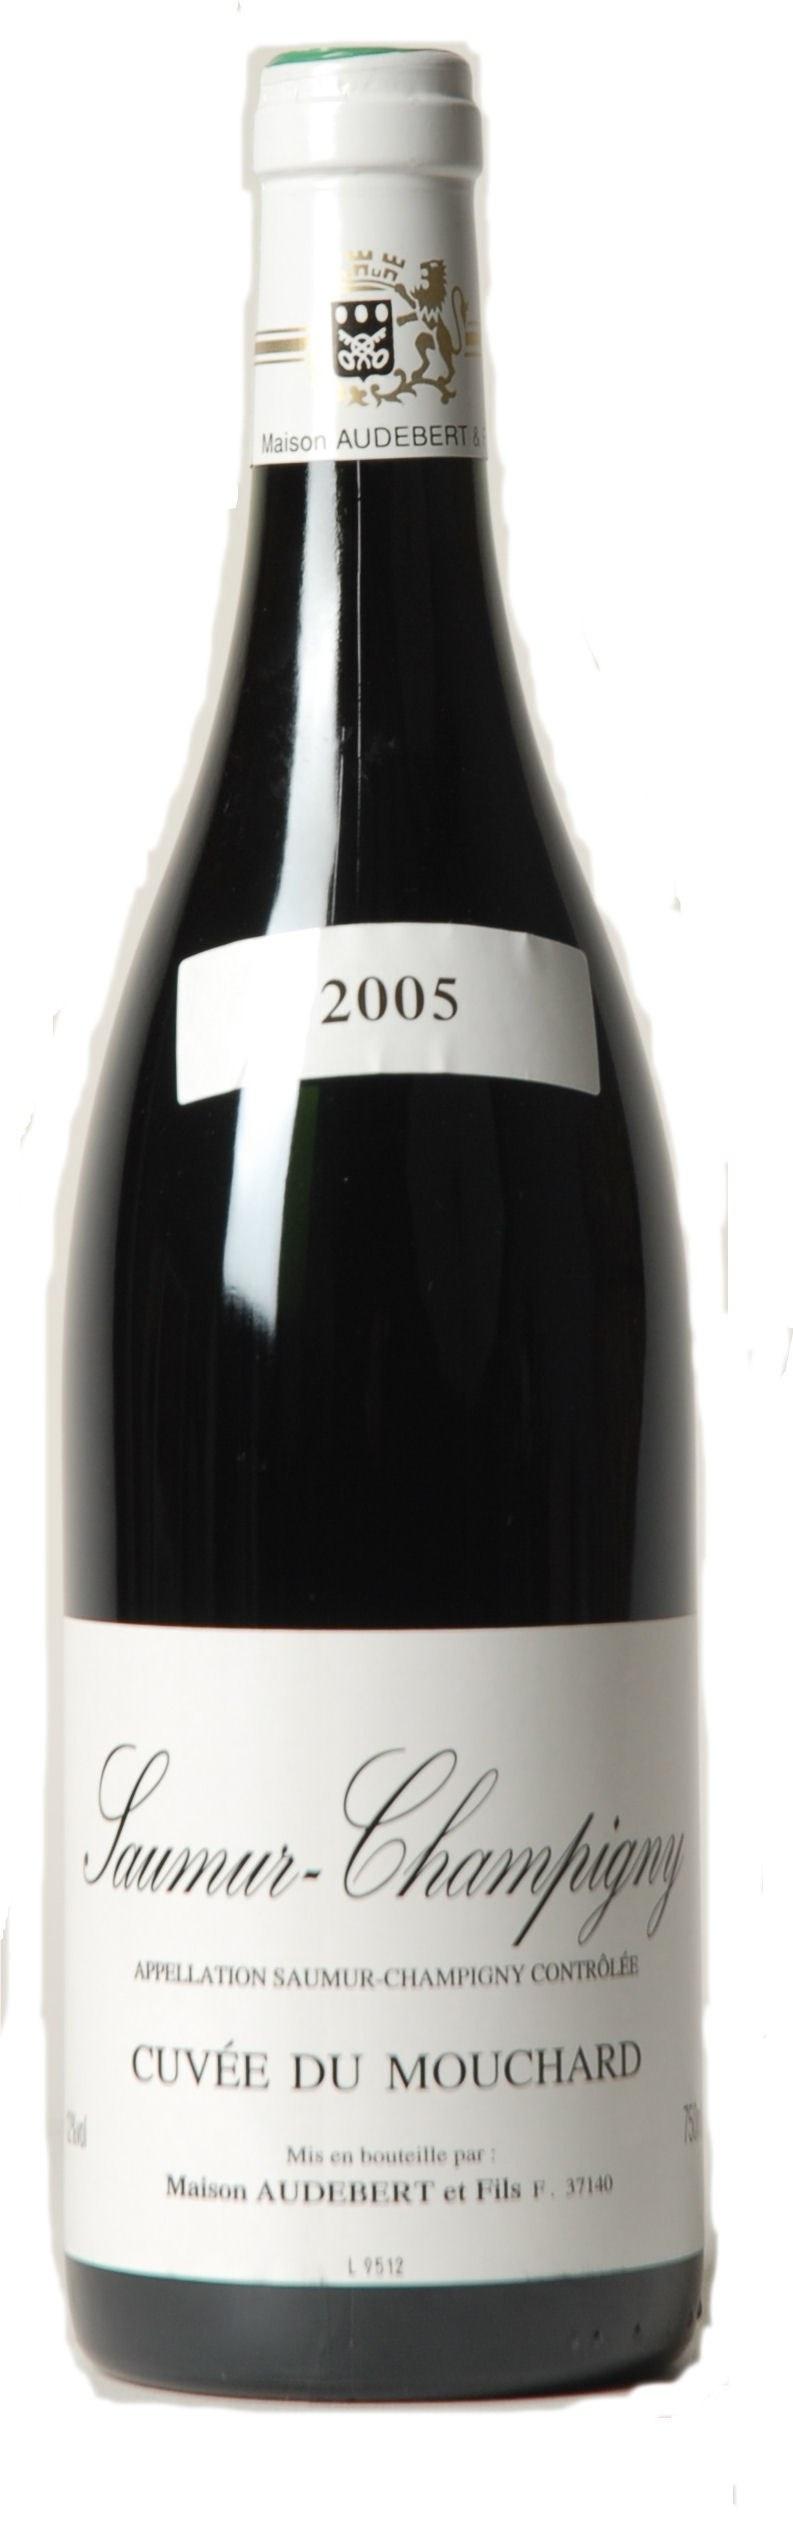 Le Mouchard 2017 - 375 ml